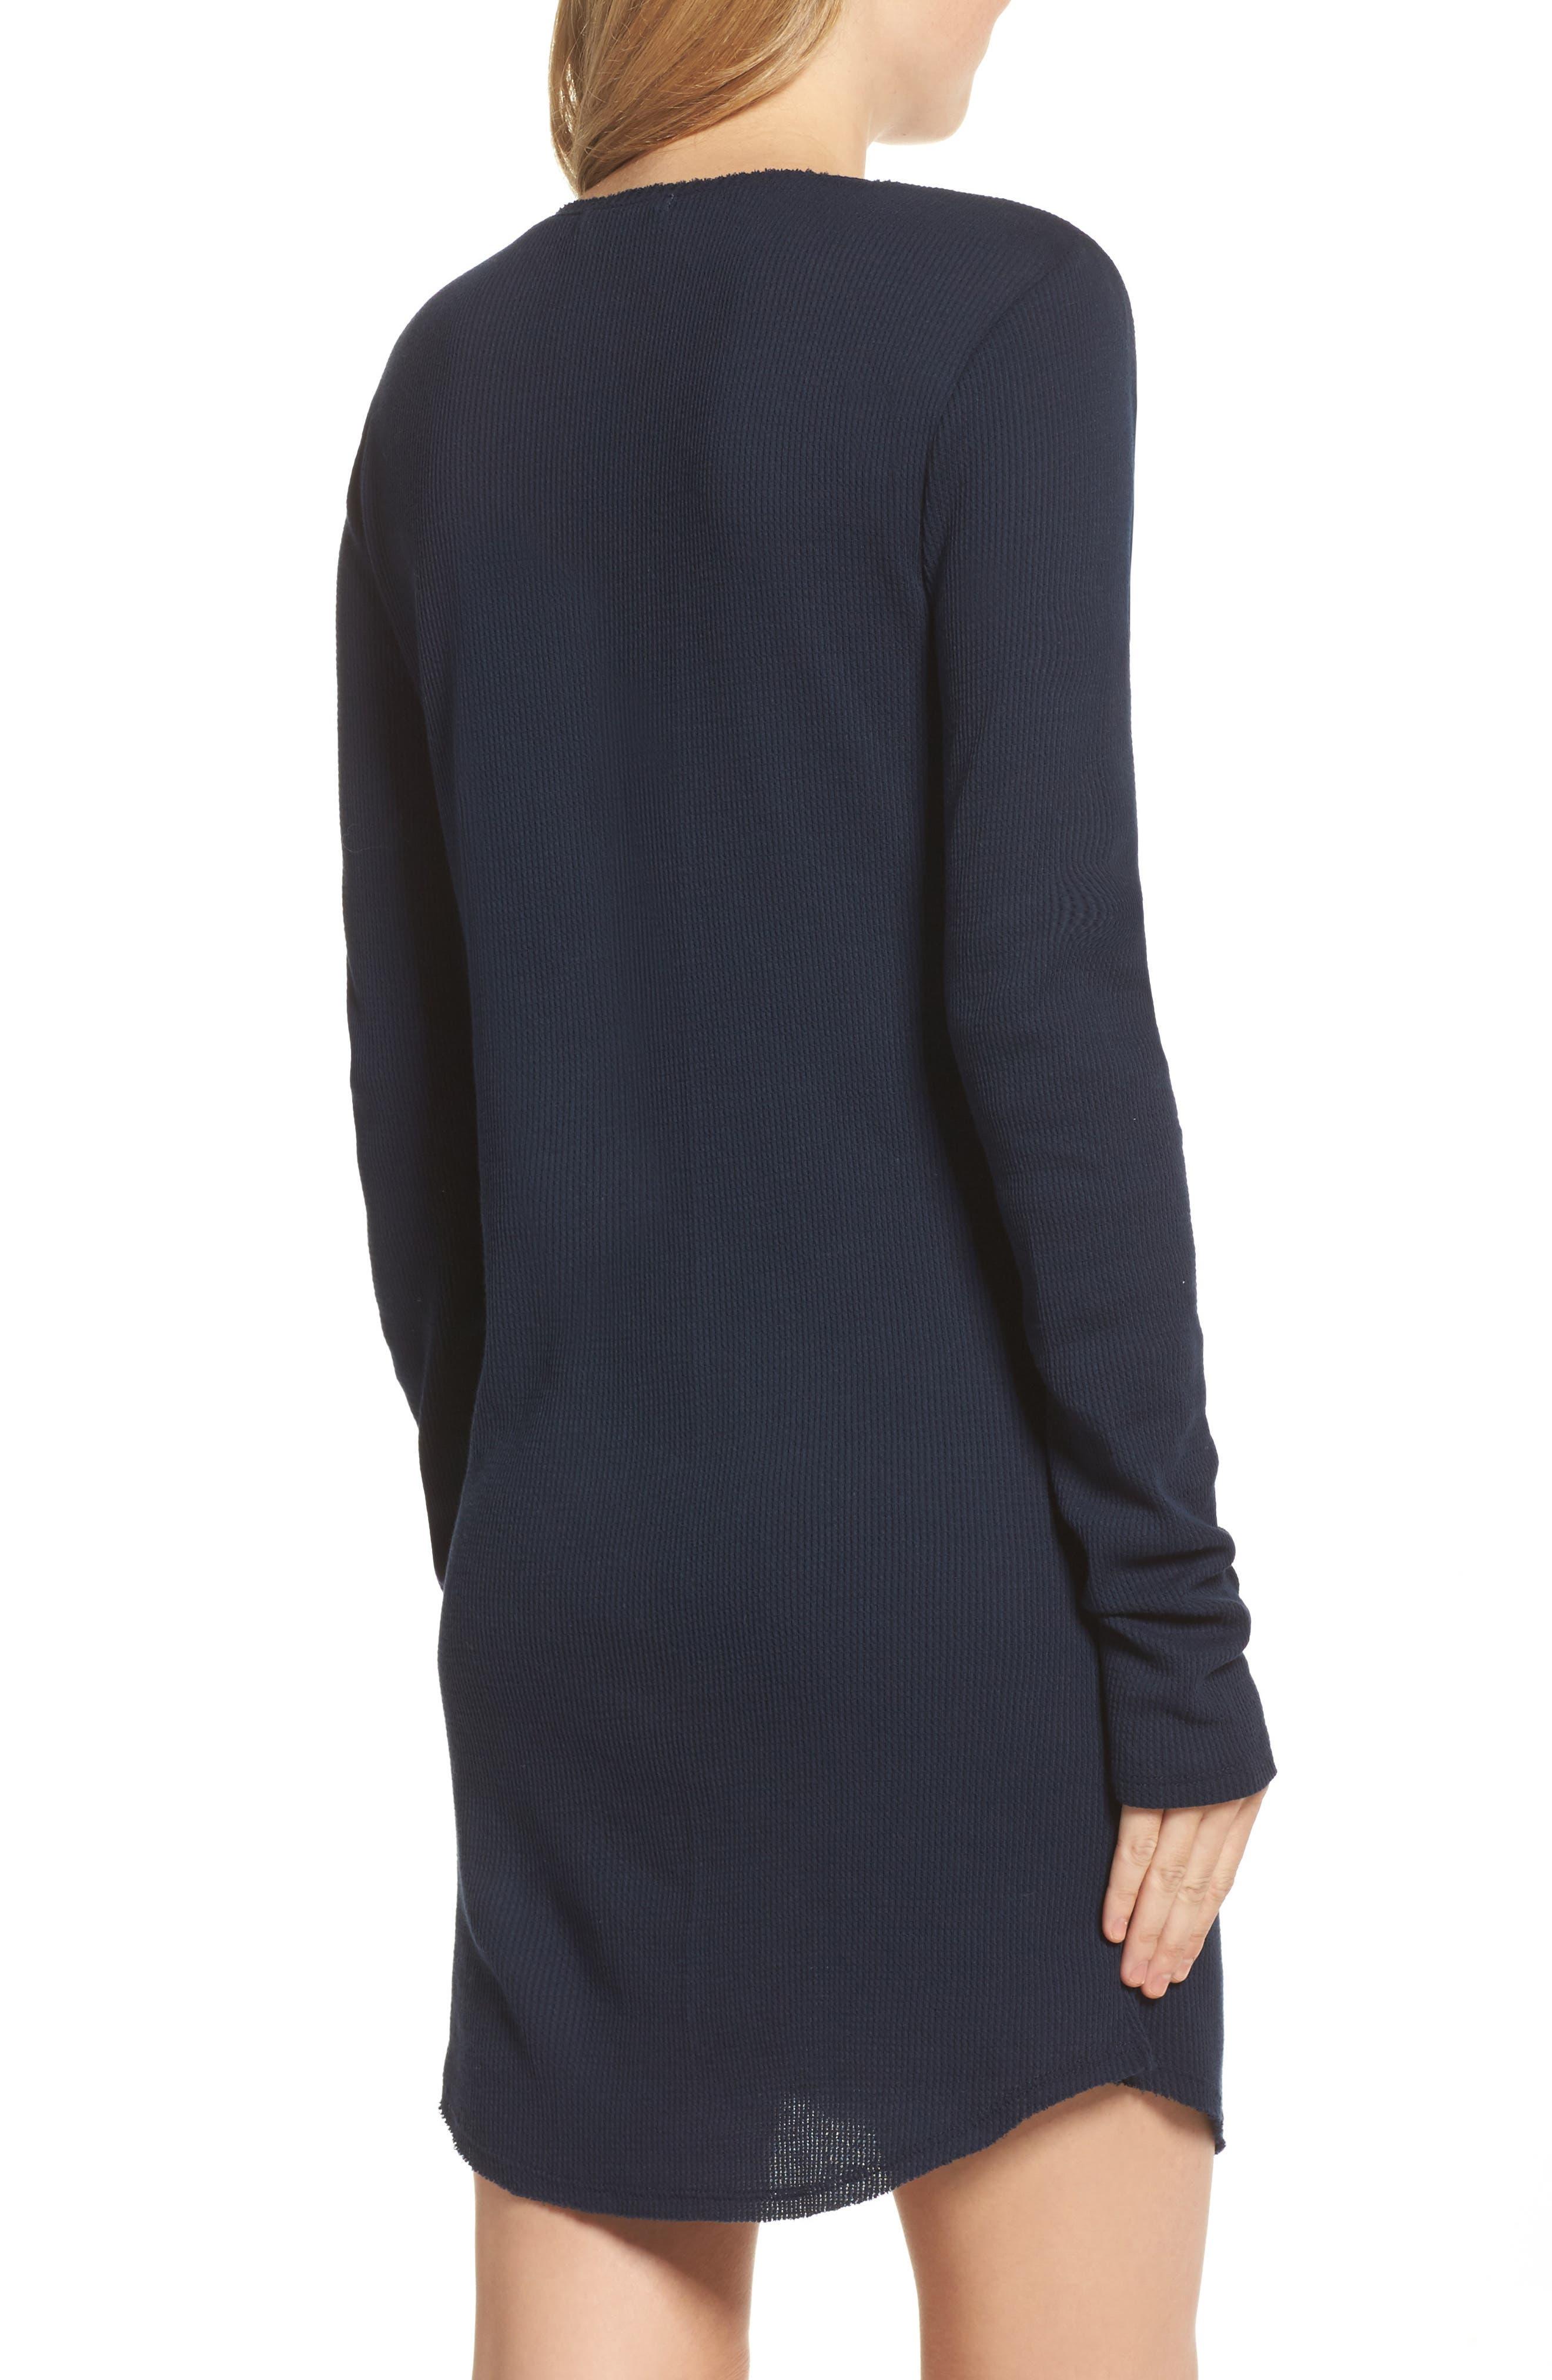 Wynn Henley Sleep Shirt,                             Alternate thumbnail 2, color,                             Bright Navy